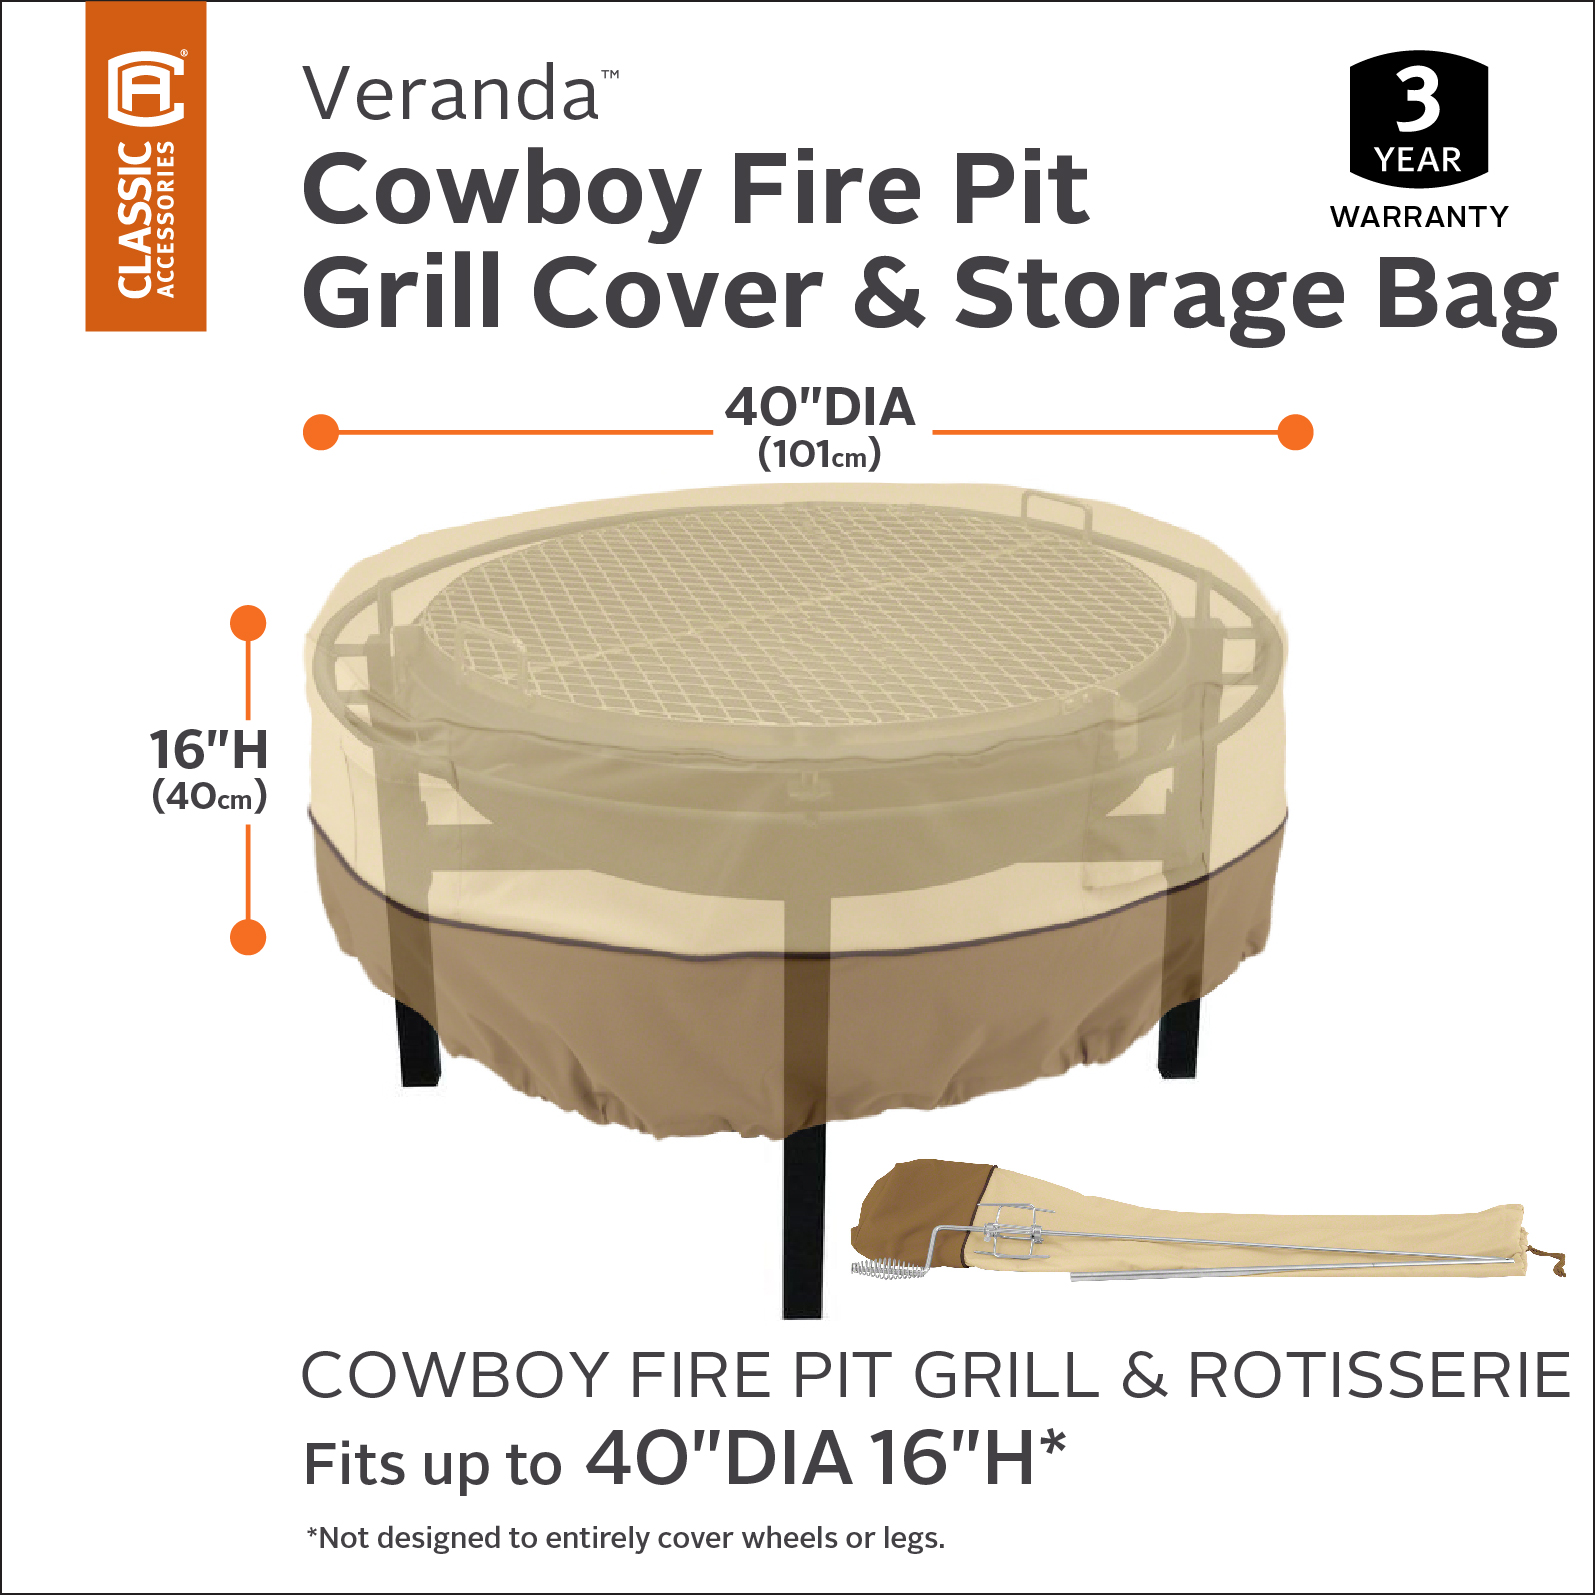 Classic Accessories Veranda Cowboy Fire Pit Grill Cover And